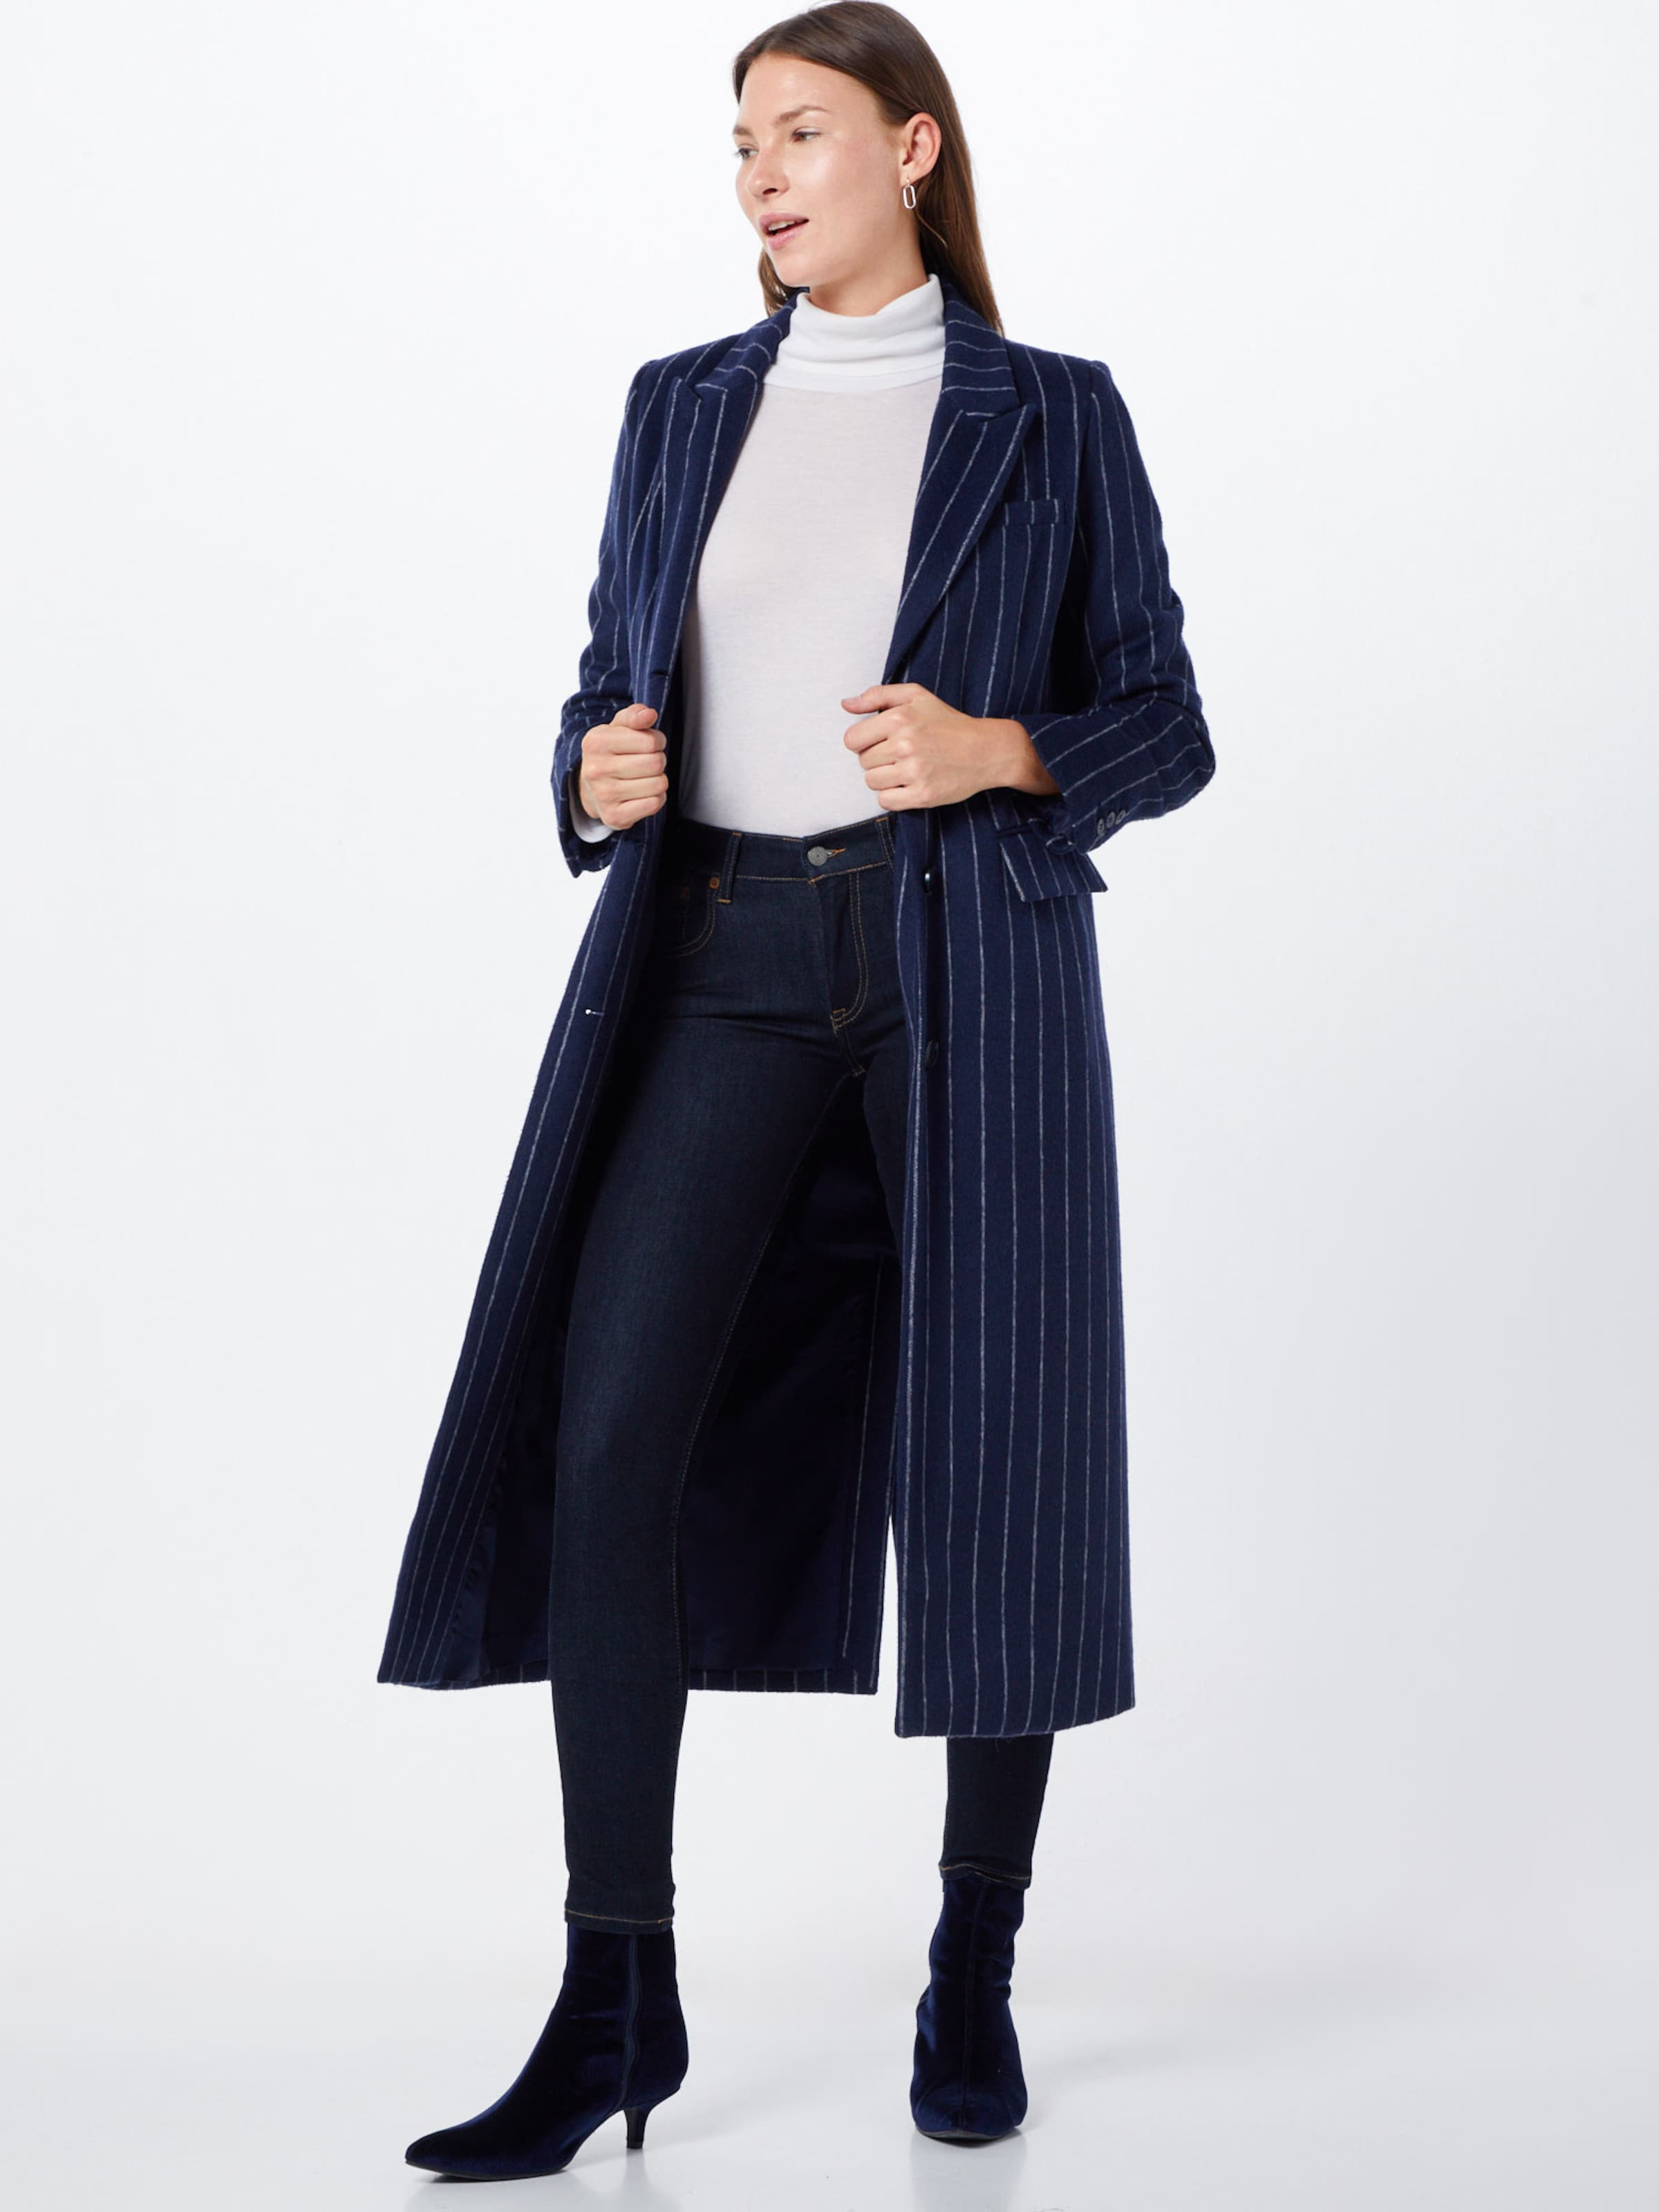 Jeans Blue Denim Lauren Ralph In Polo eEIDW2YH9